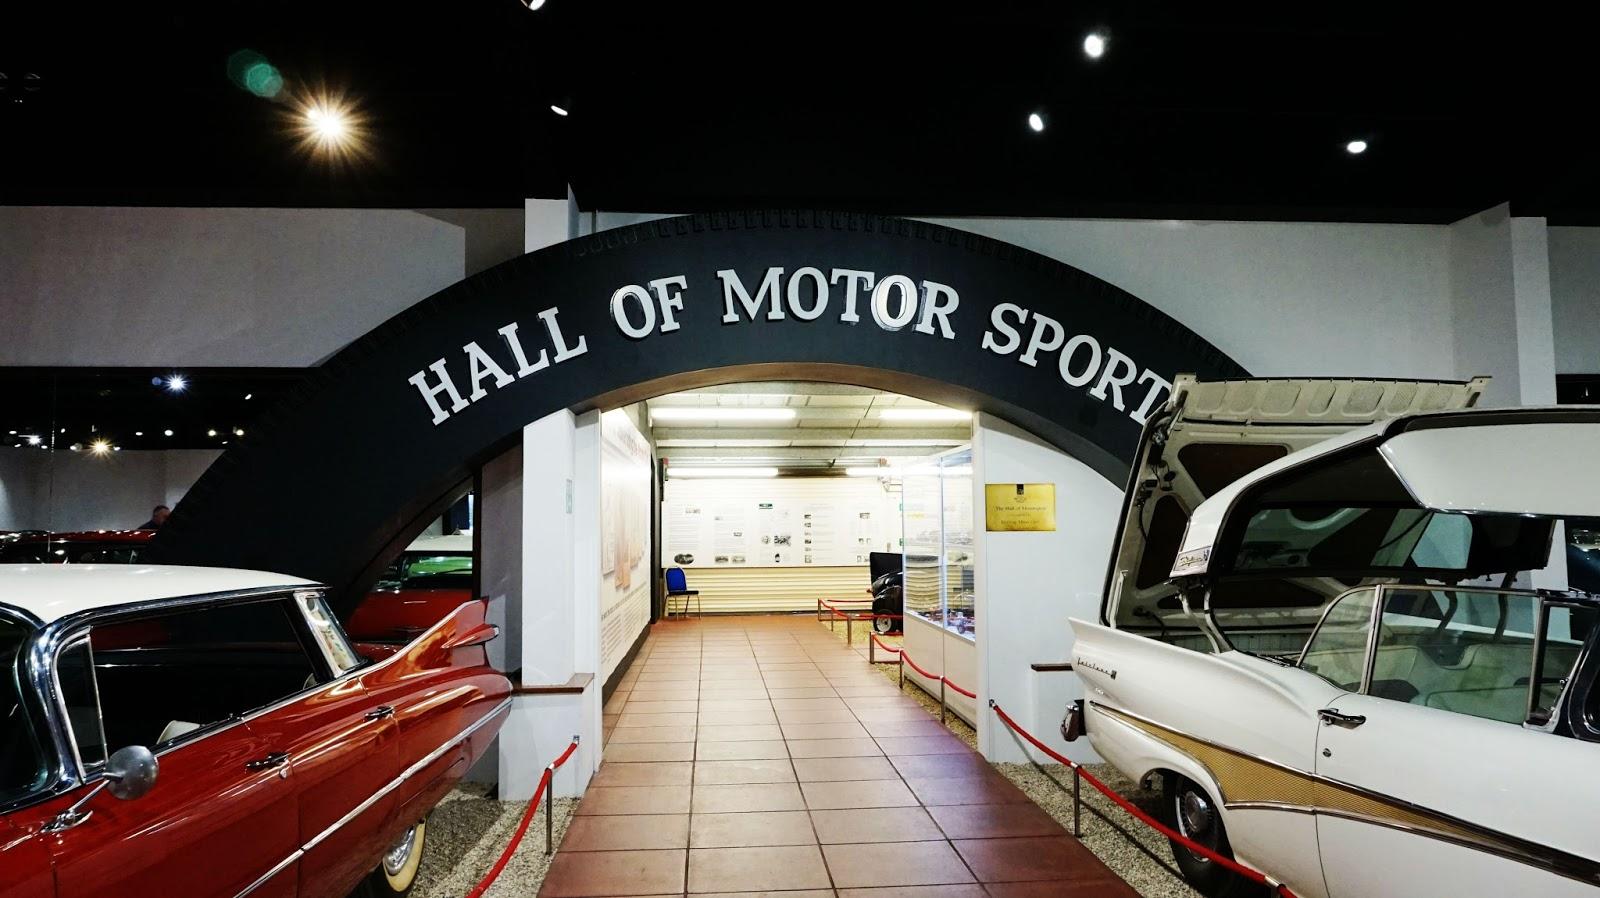 hall of motor sports car super car classic car nostalgic haynes motor museum